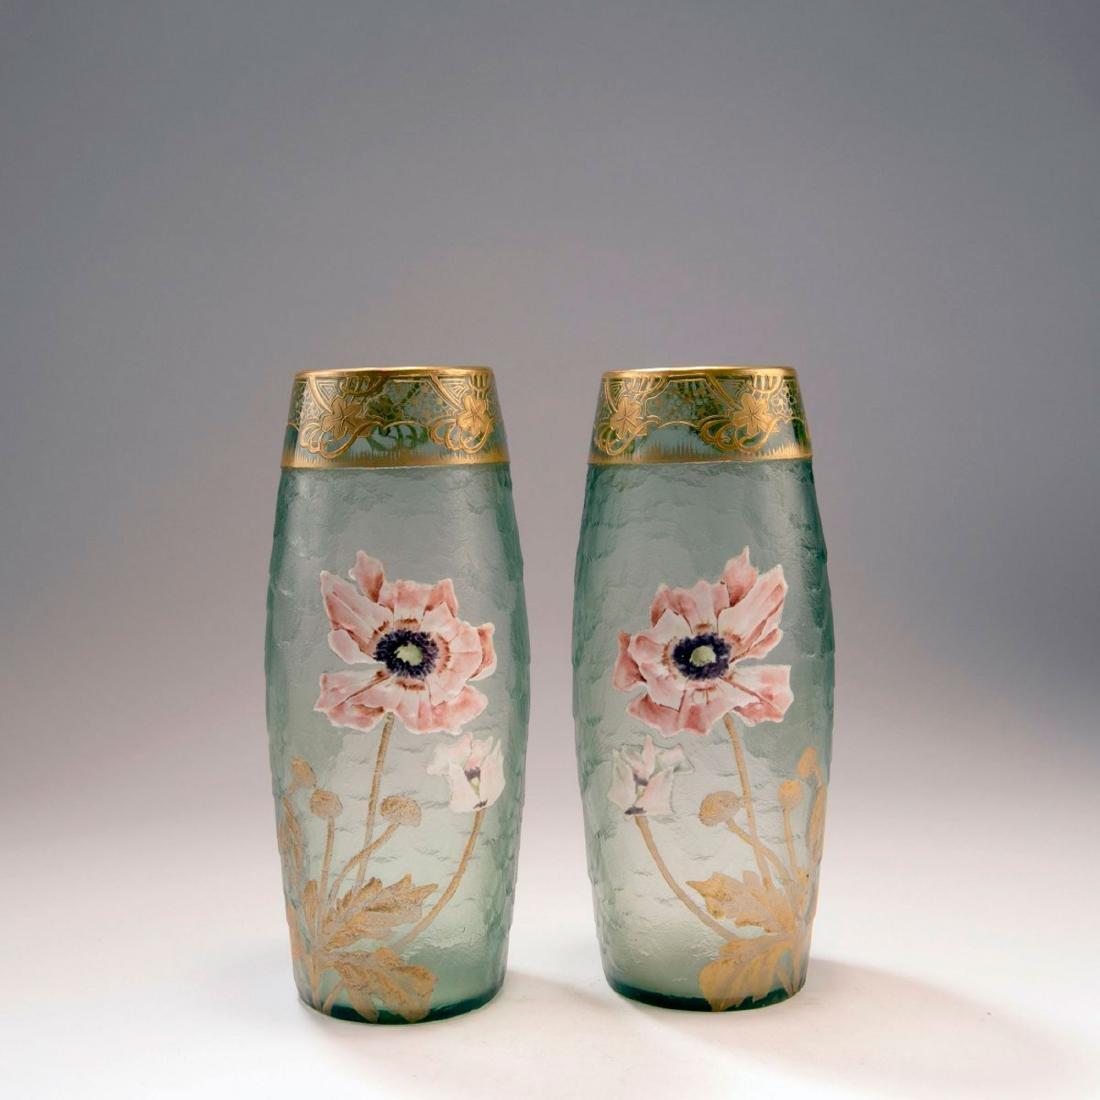 Pair of 'Pavots' vases, 1900